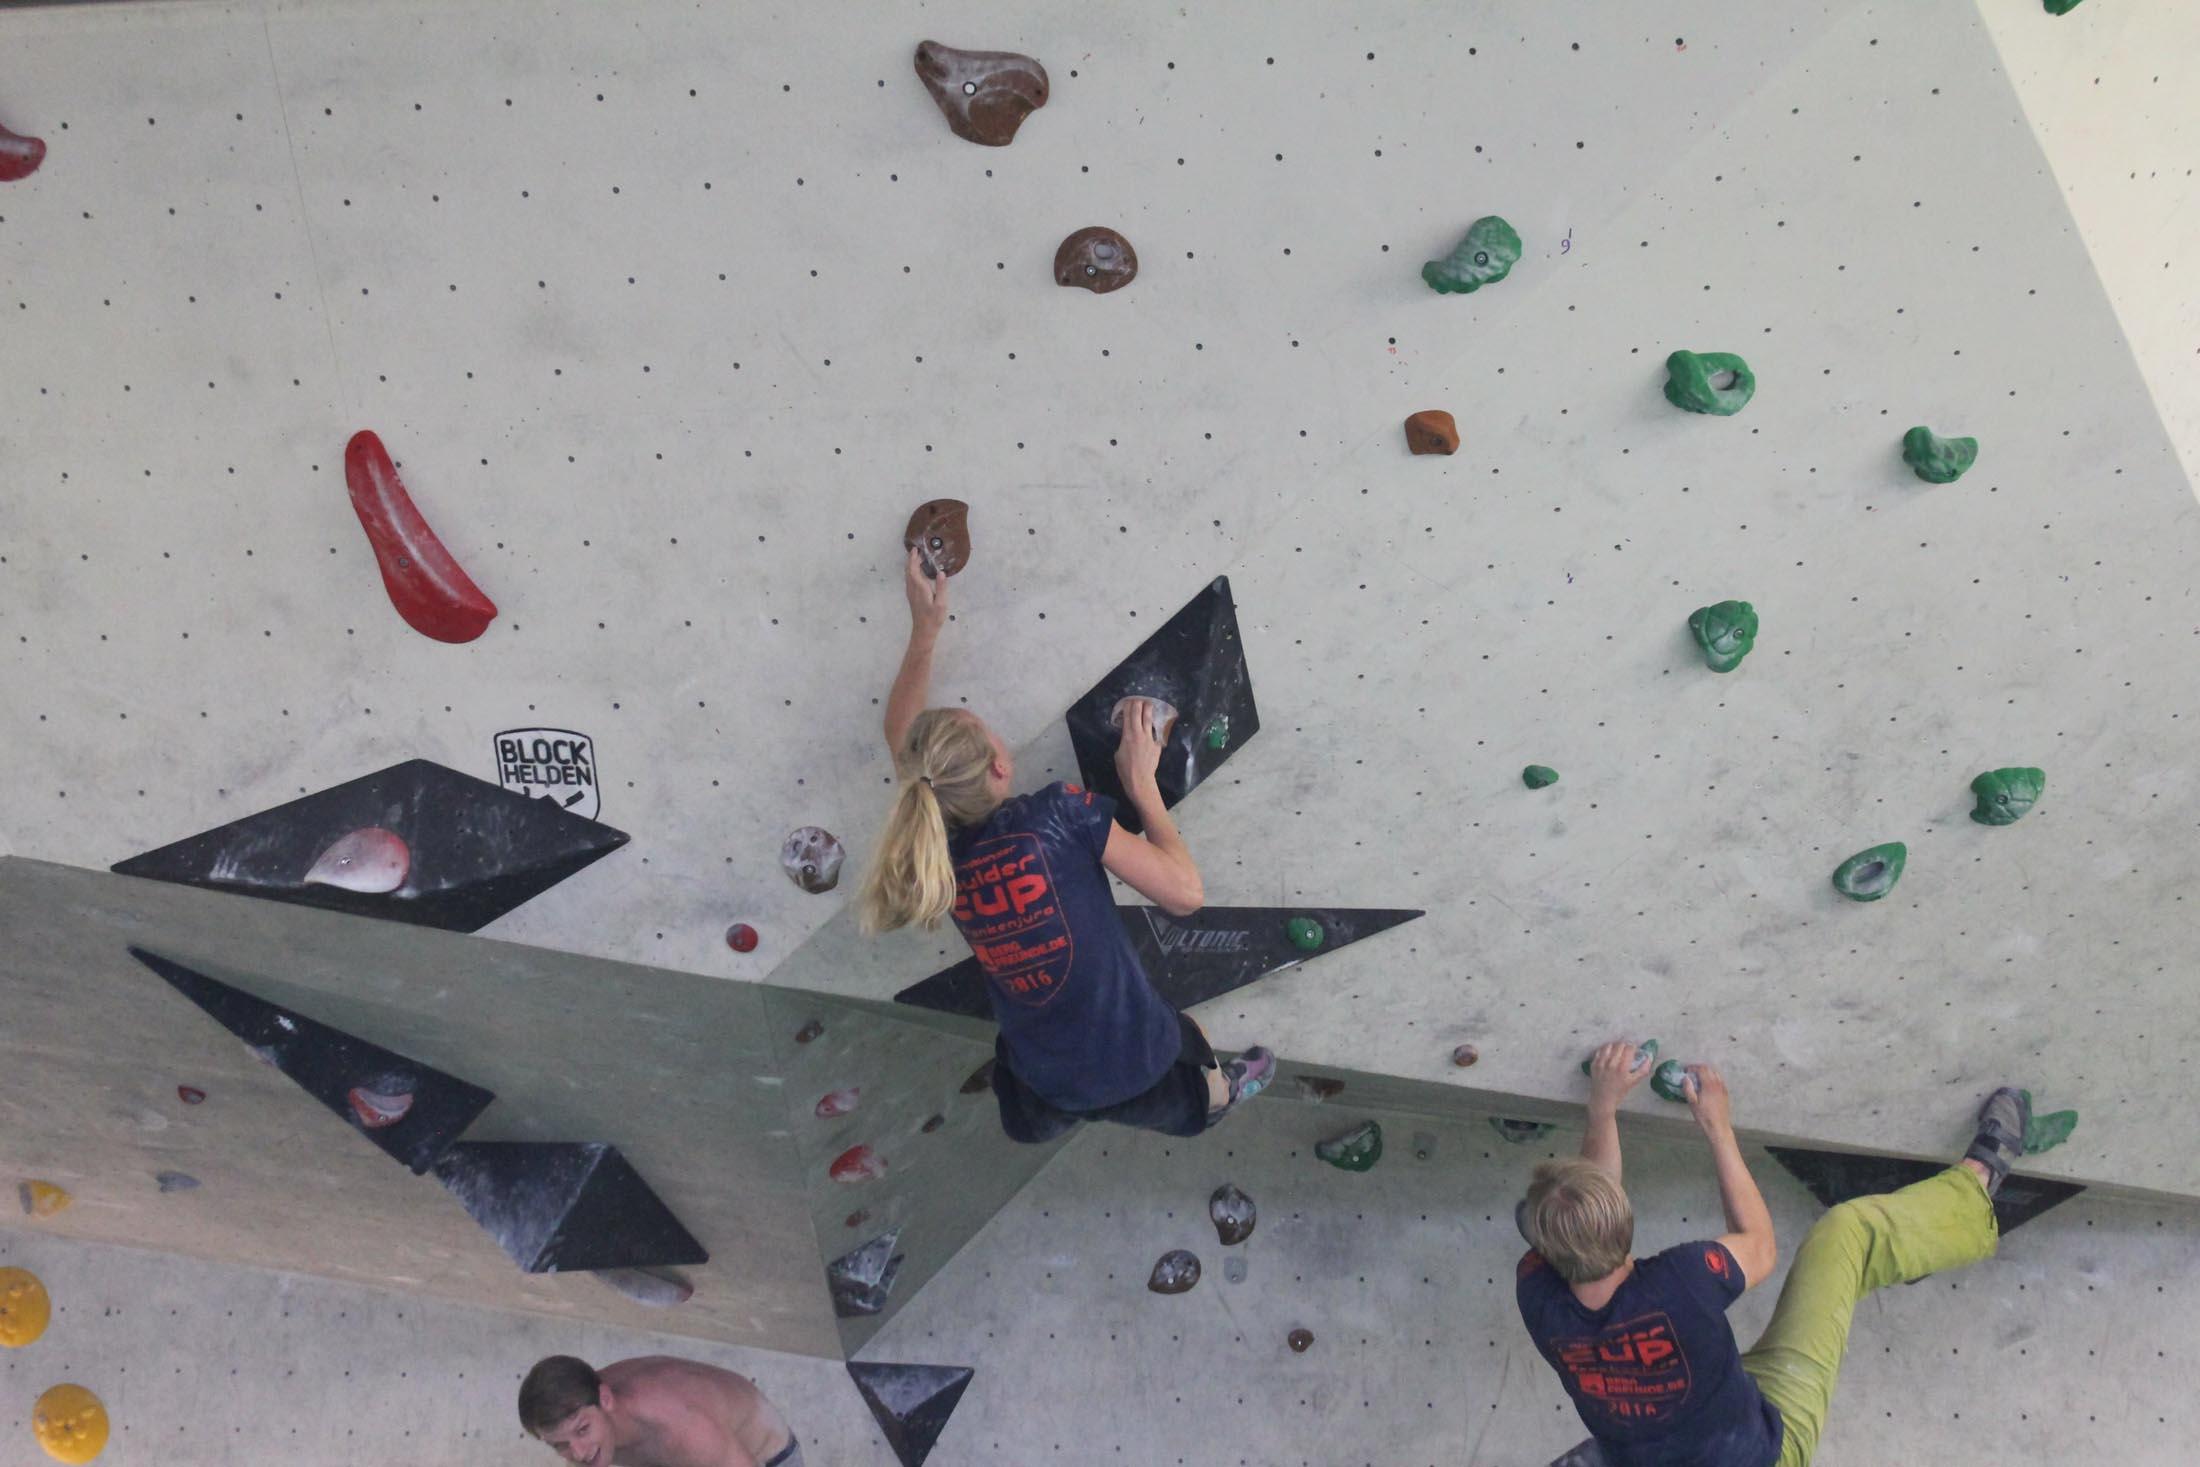 Quali, internationaler bouldercup Frankenjura 2016, BLOCKHELDEN Erlangen, Mammut, Bergfreunde.de, Boulderwettkampf07092016278